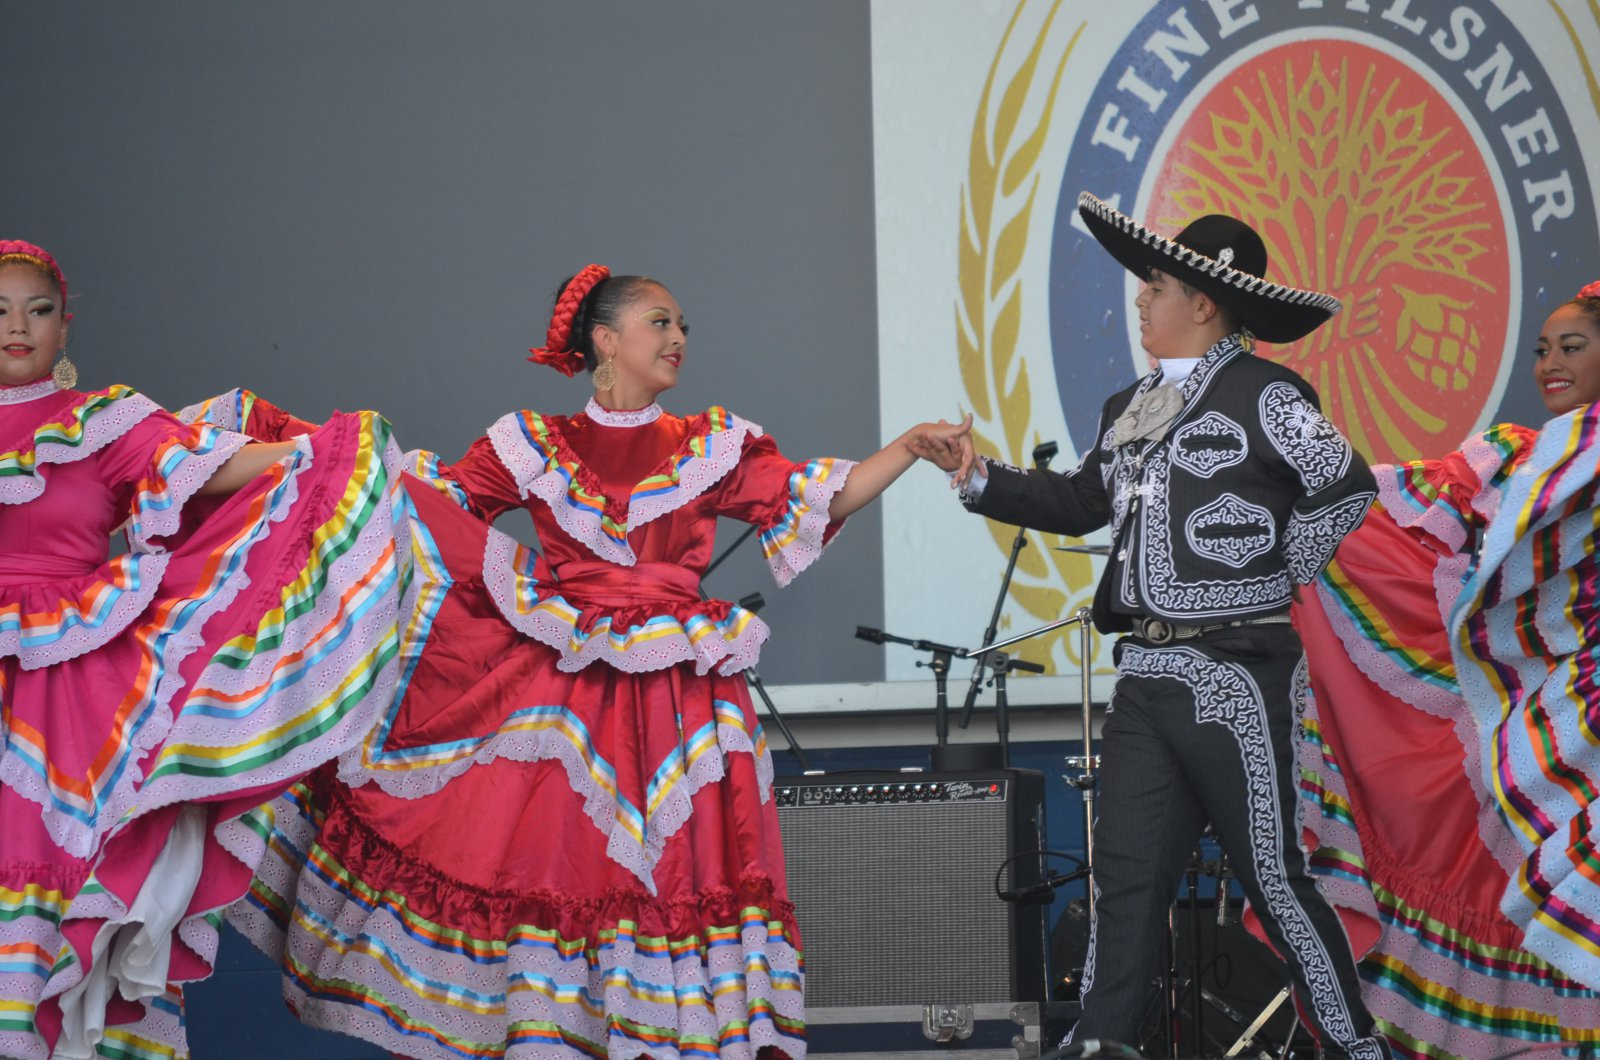 Mexican Fiesta 2015